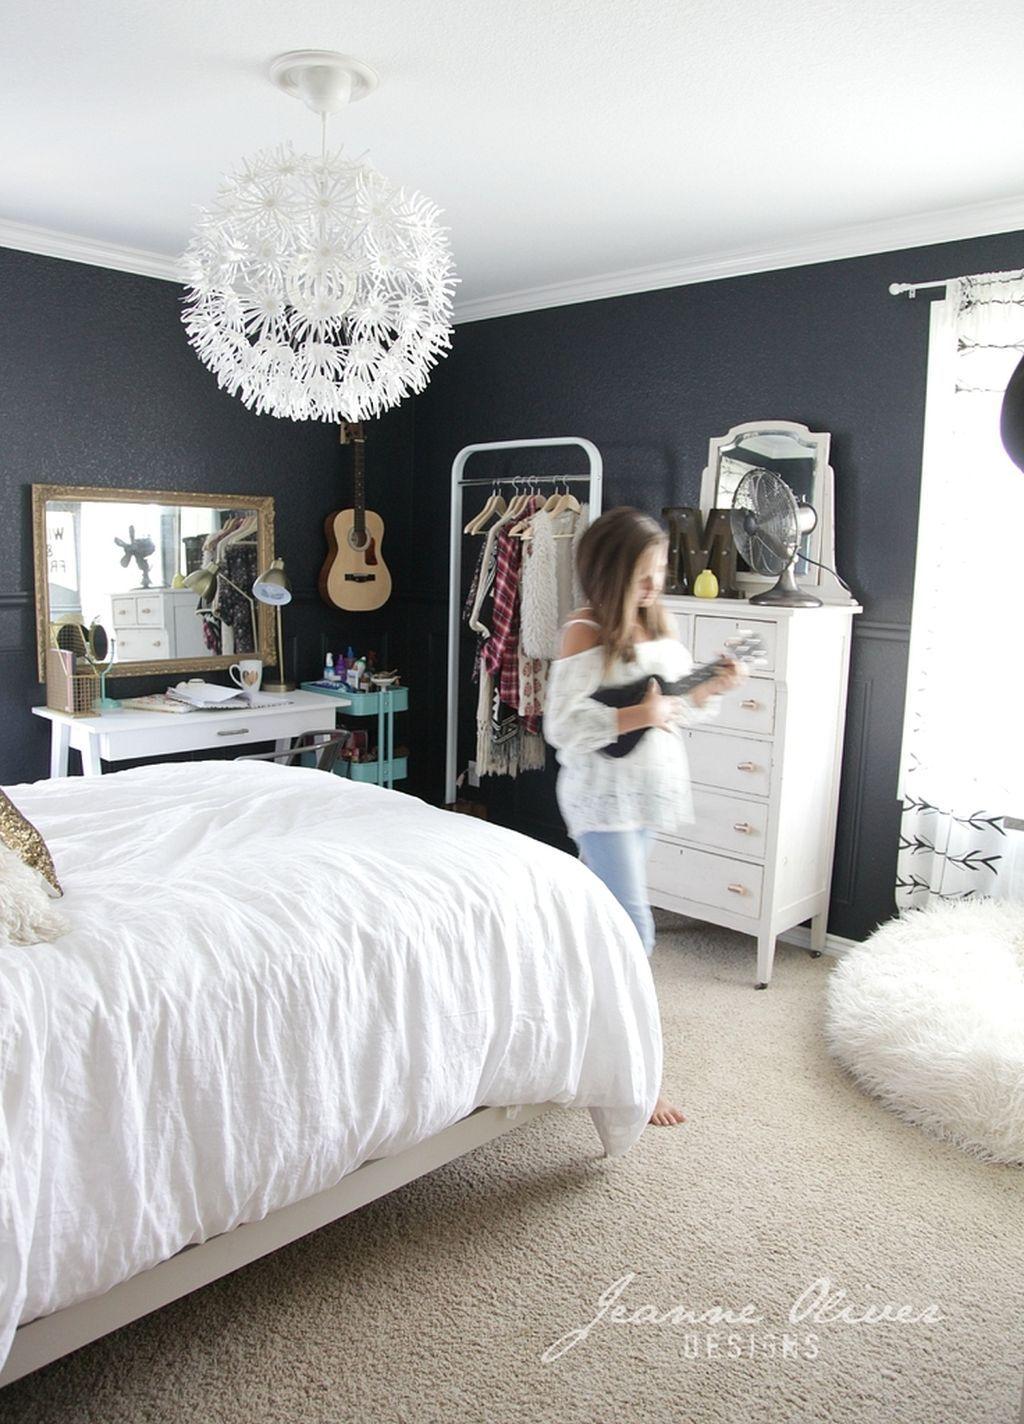 40 Stylish Bedroom Decoration Ideas with White Furniture | White ...